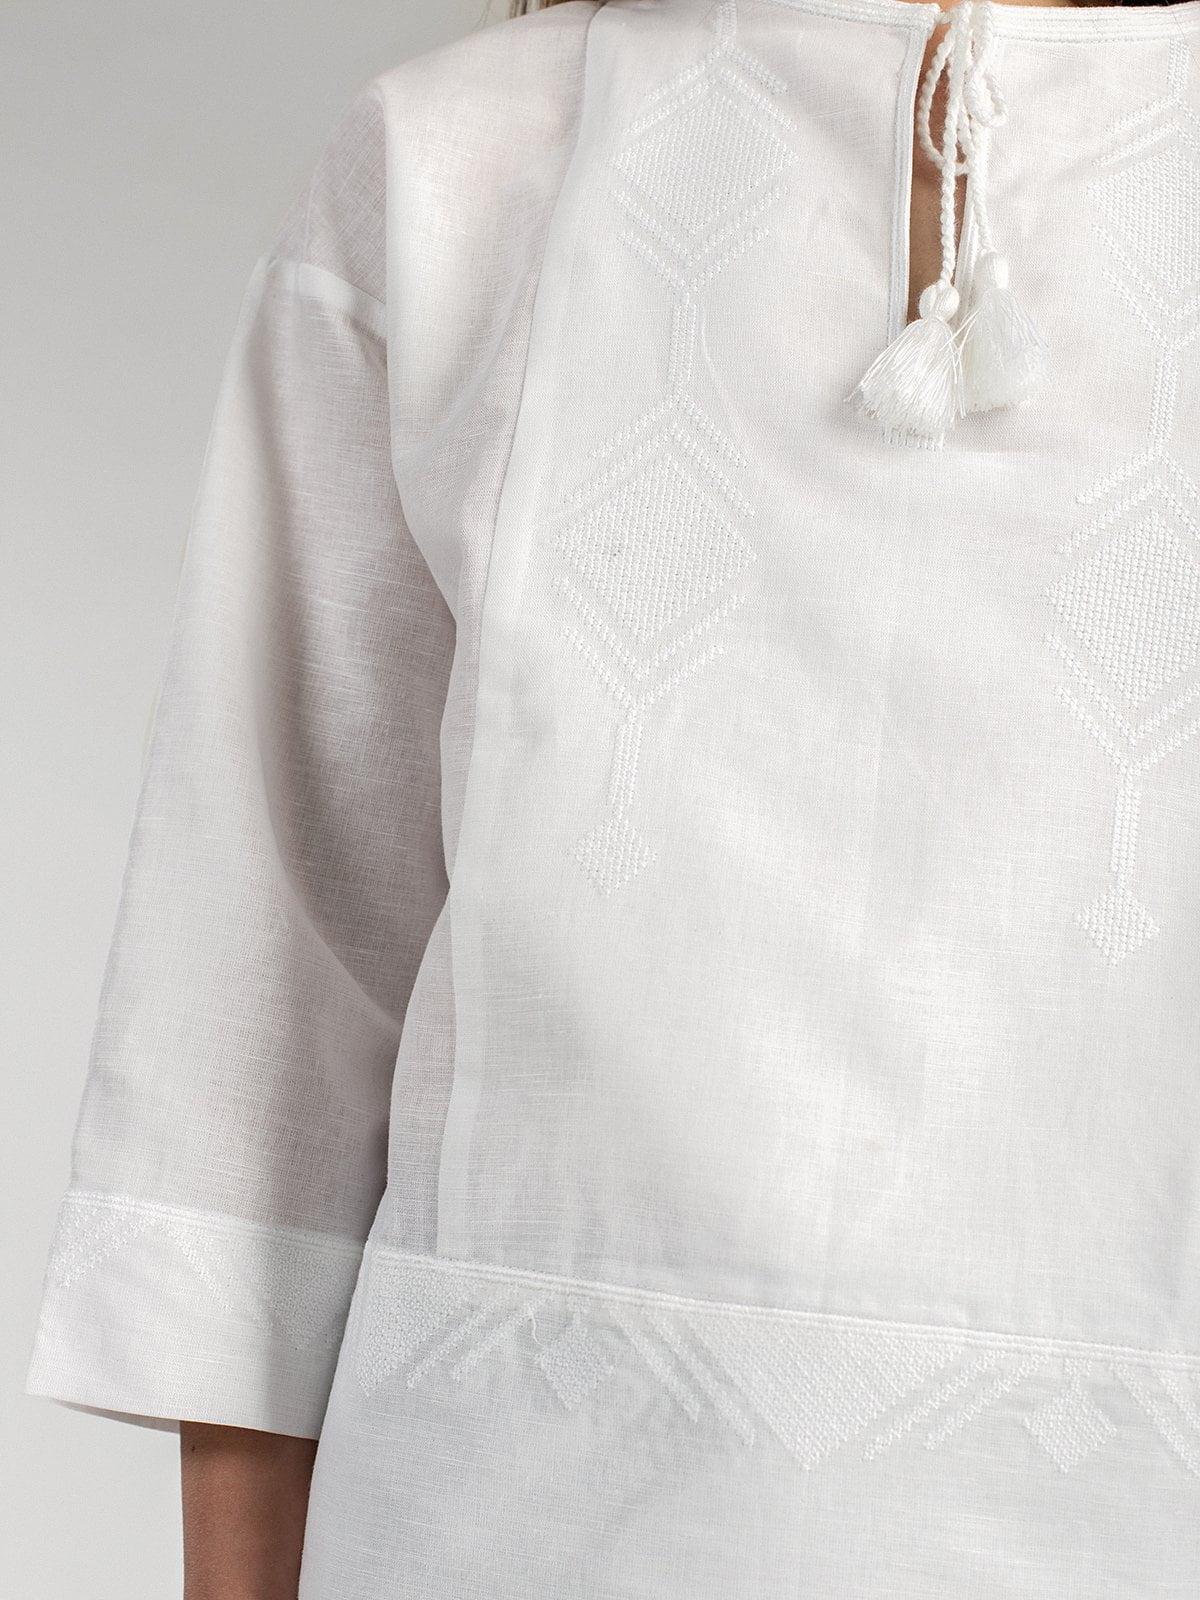 Женская вышиванка свободного кроя из белого льна Ethnic 1. Жіноча вишиванка  вільного крою з білого льону ... 97f277c69b5ee